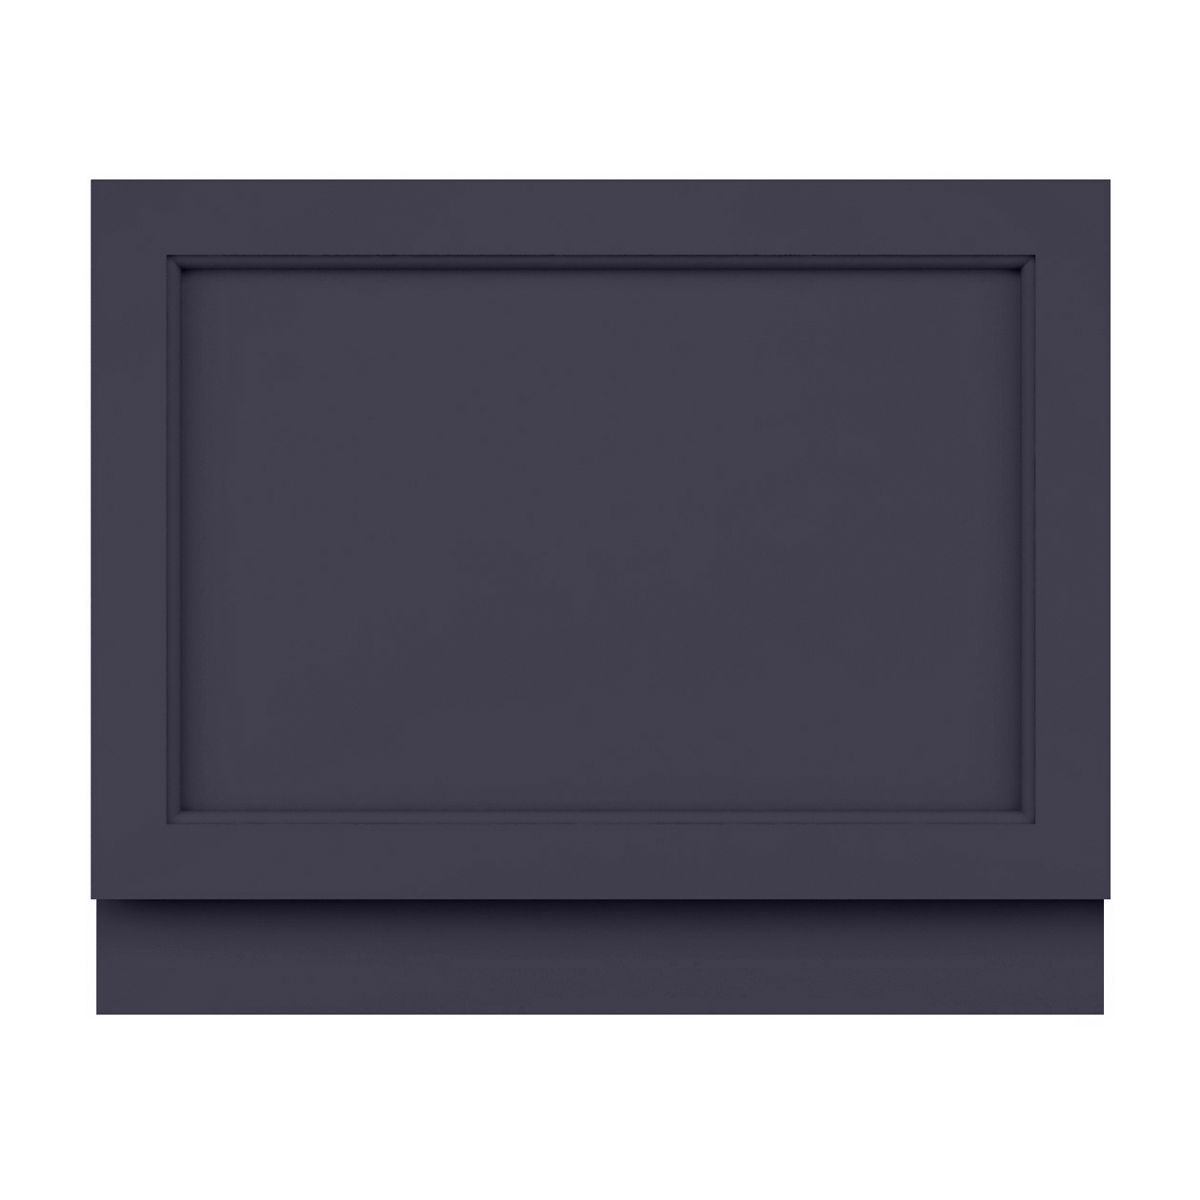 Old London Twilight Blue End Bath Panel 750mm